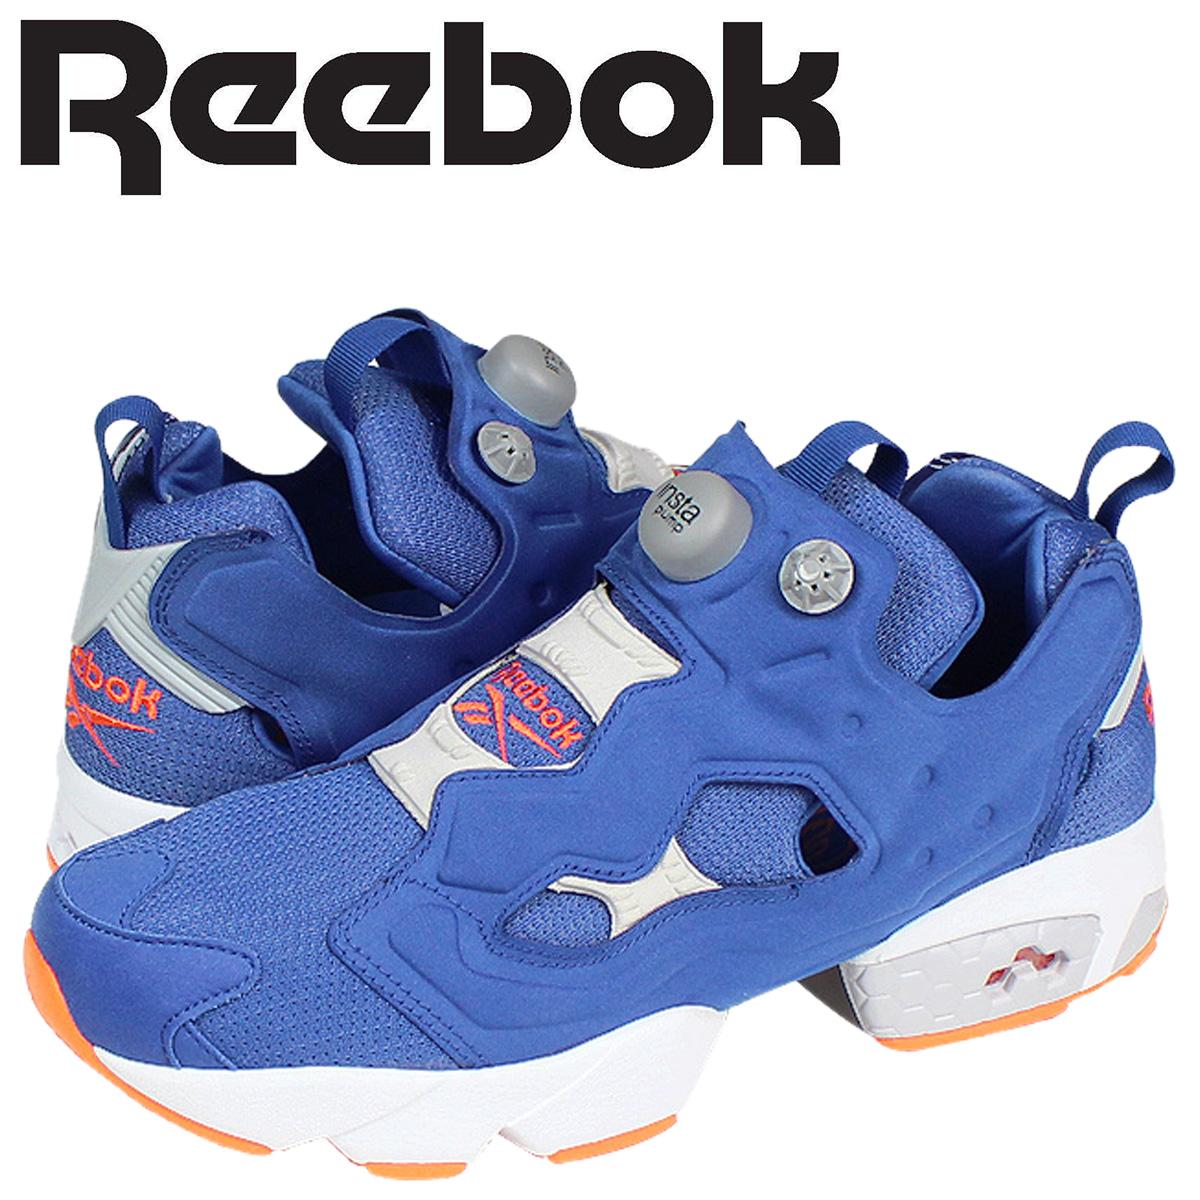 Reebok リーボック ポンプフューリー スニーカー INSTAPUMP FURY 20周年 M42231 メンズ 靴 ブルー 【決算セール 返品不可】